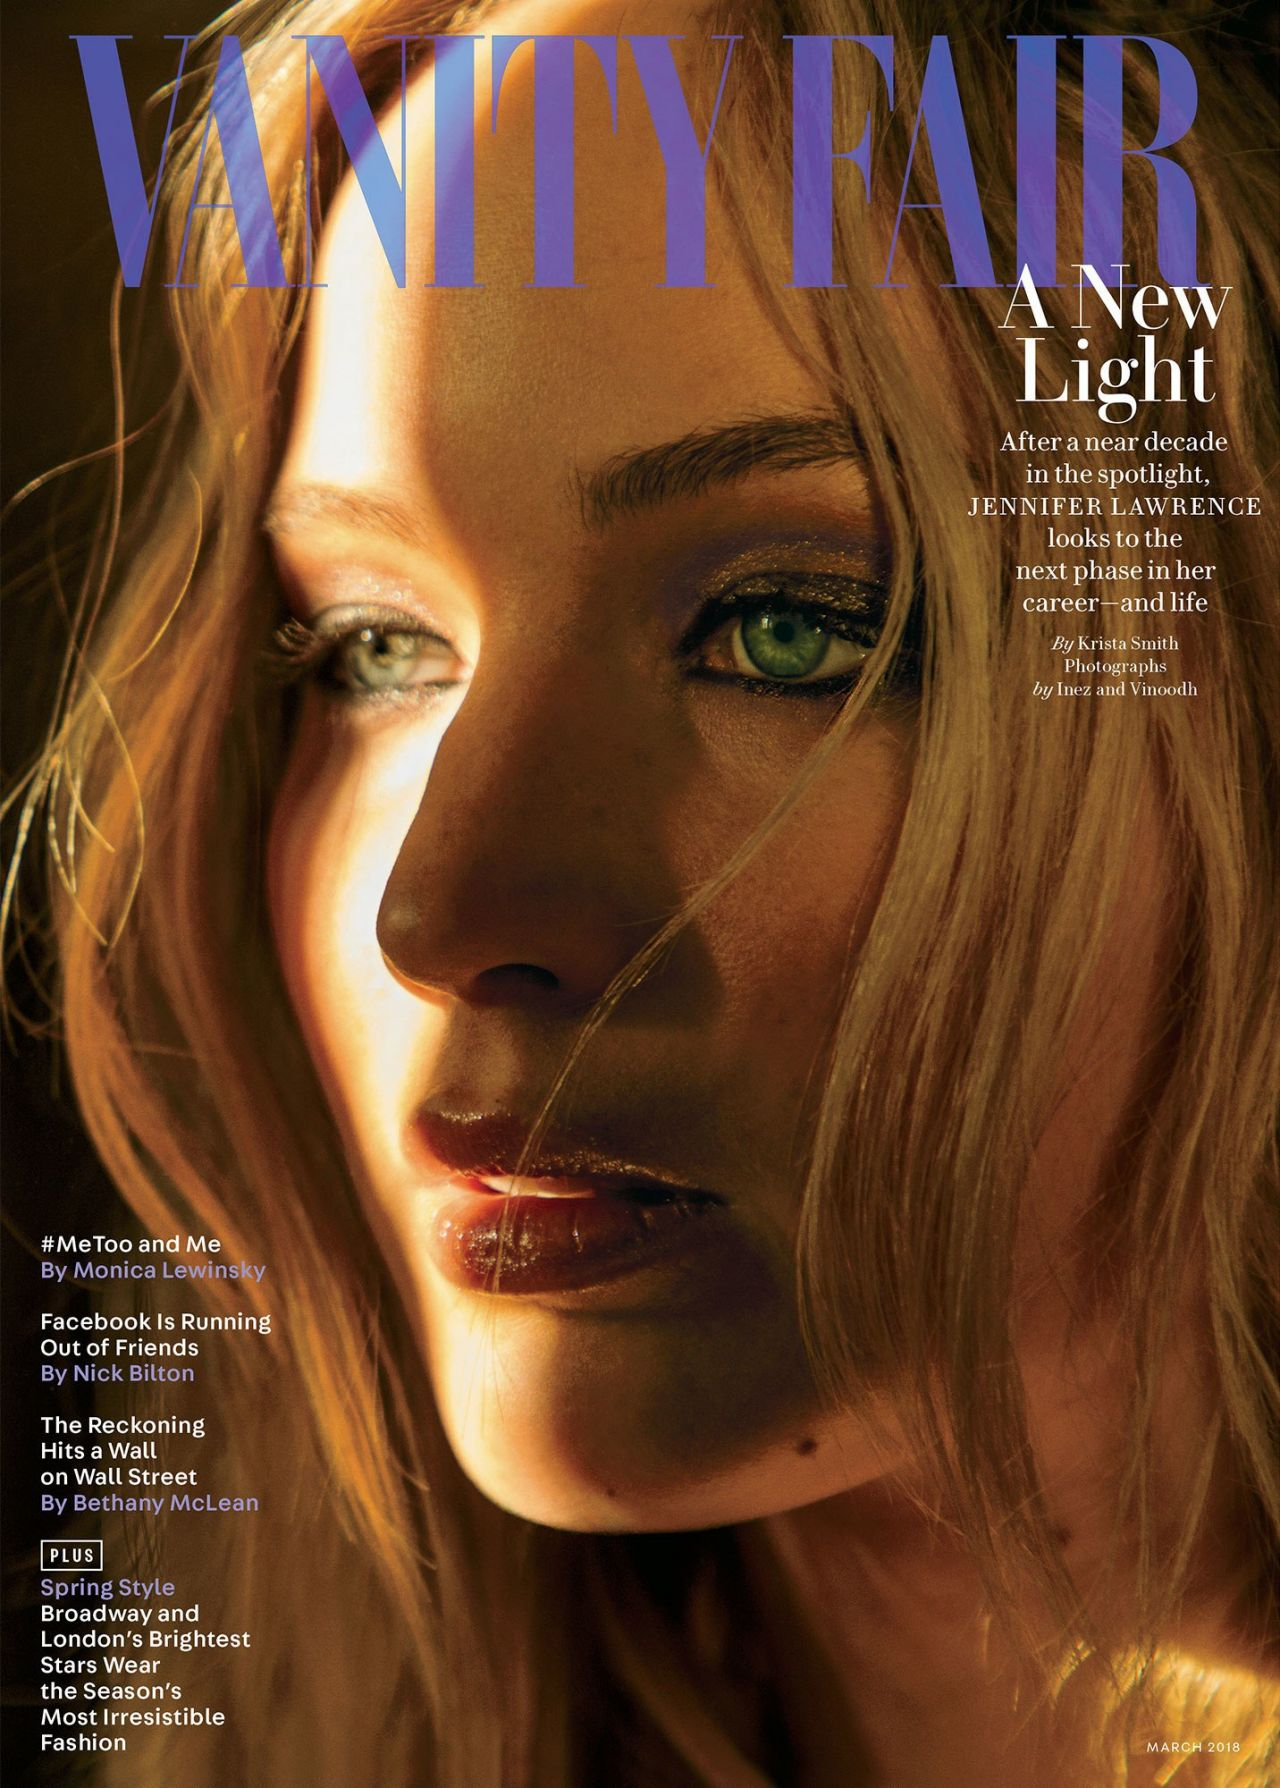 Post Malone 2019 >> Jennifer Lawrence - Vanity Fair Magazine March 2018 Photoshoot